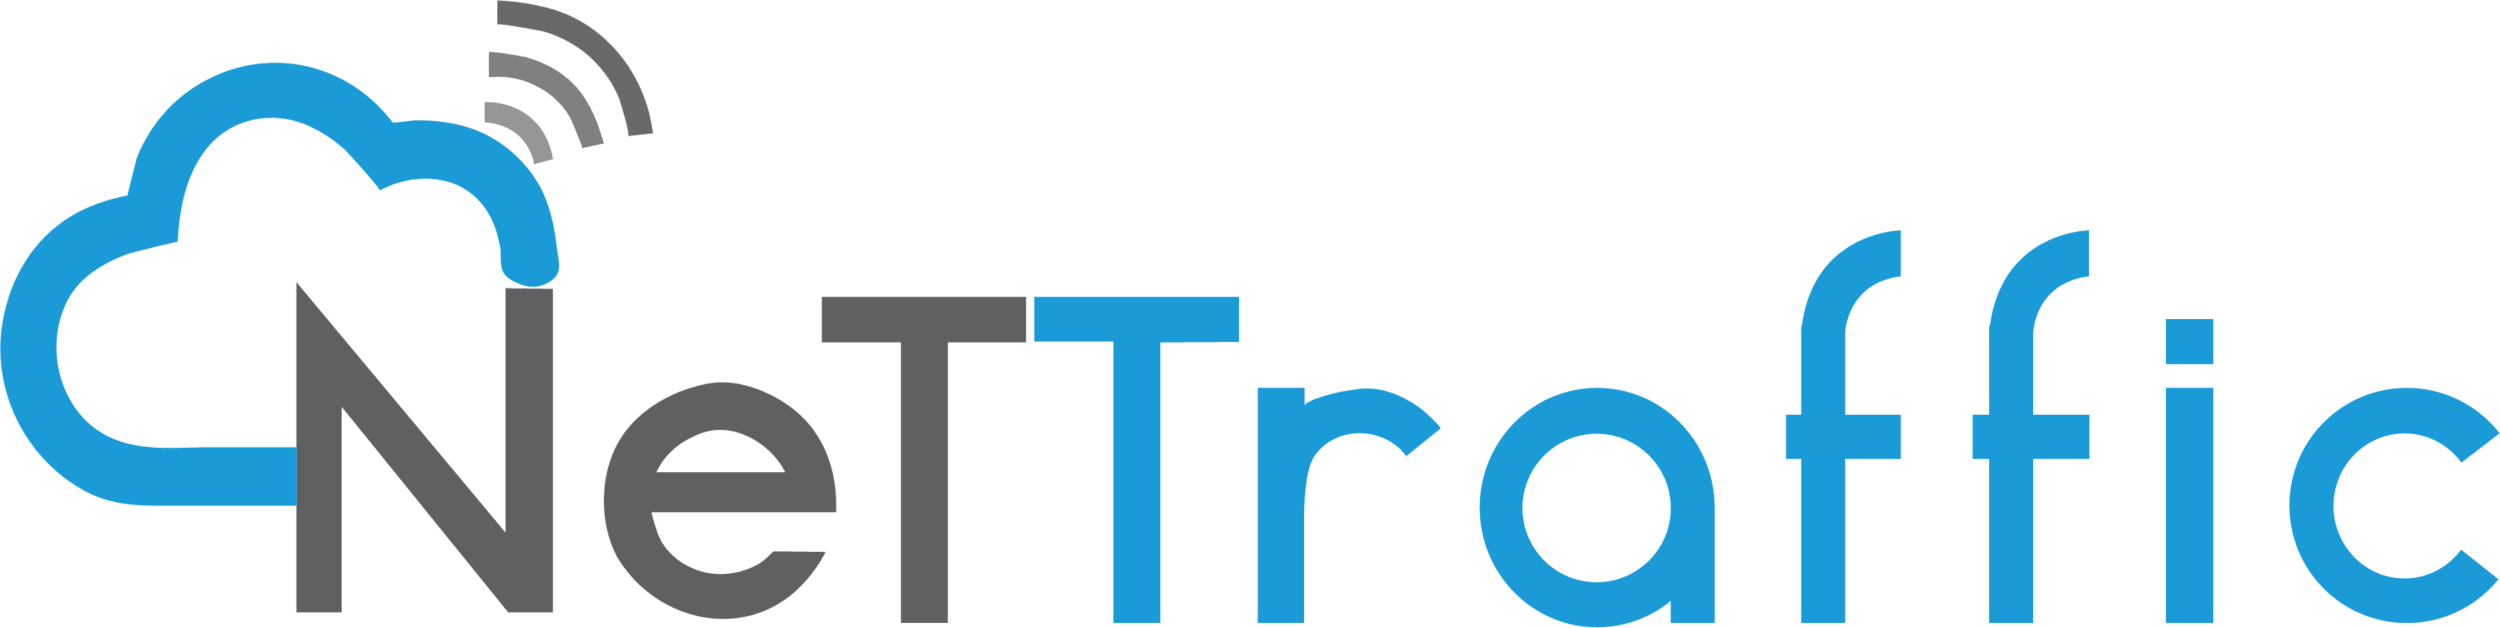 Nettraffic Logo.png